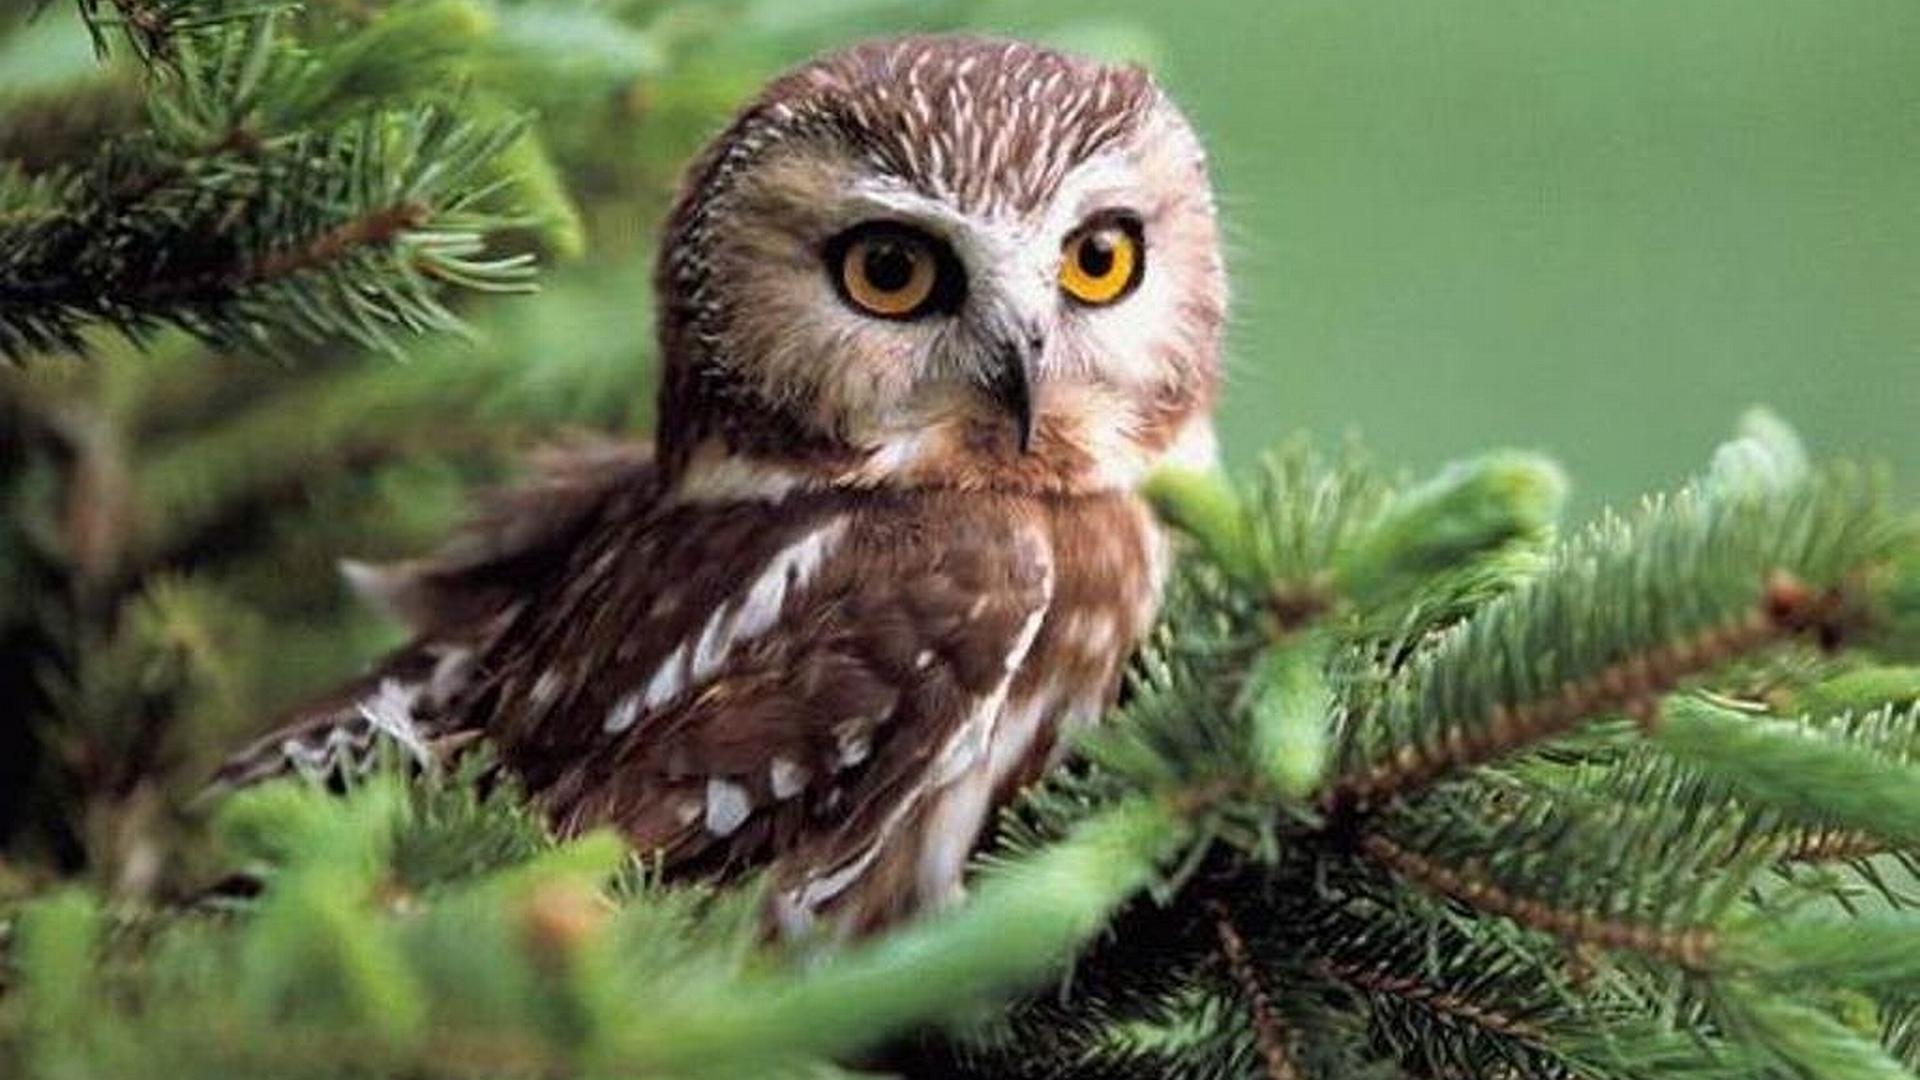 big eyes owl wallpapers image